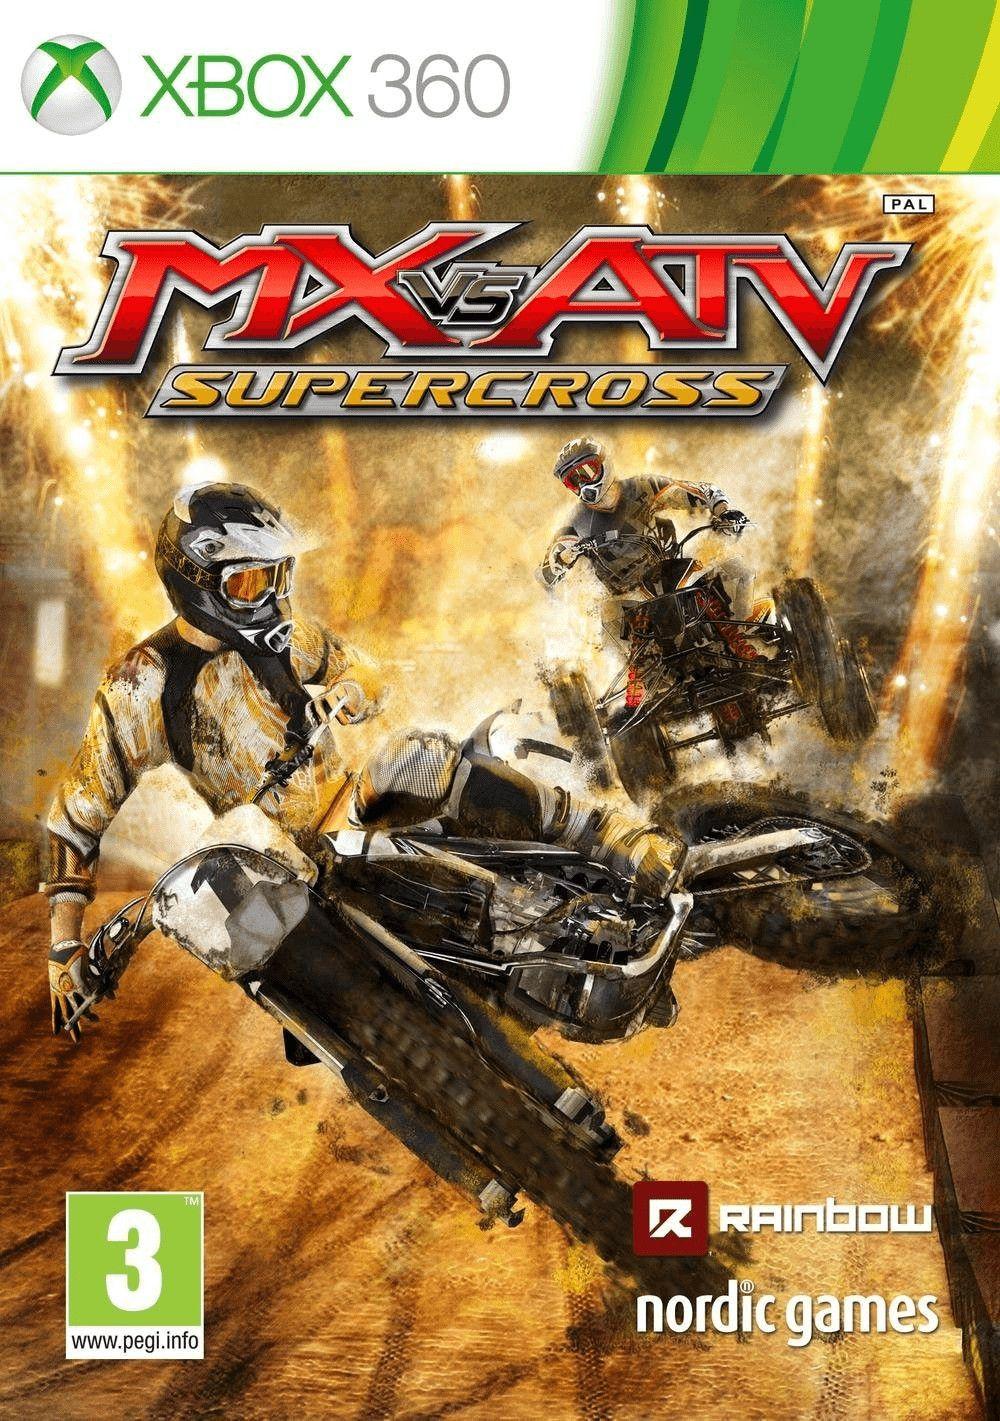 Mx Vs Atv Supercross Xbox 360 Nordic Games Upcoming Video Games Xbox One Games